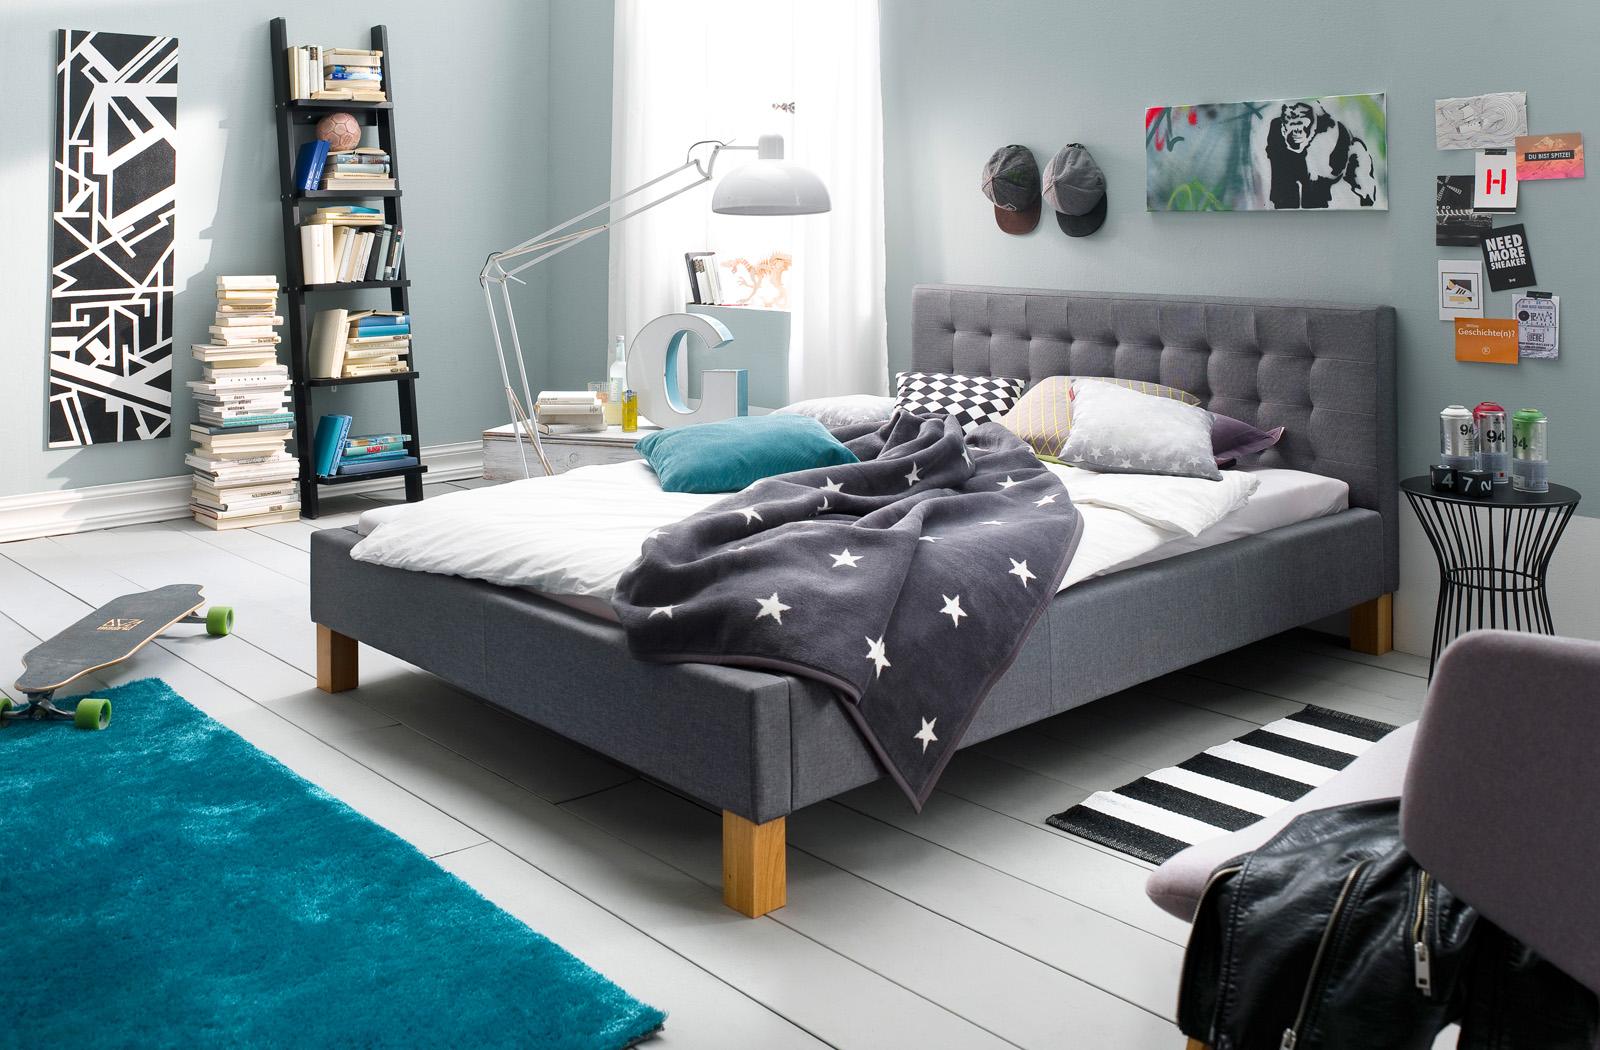 Polsterbett Futonbett Doppelbett Bettgestell Bett 140x200 cm Grau Yente – Bild 6